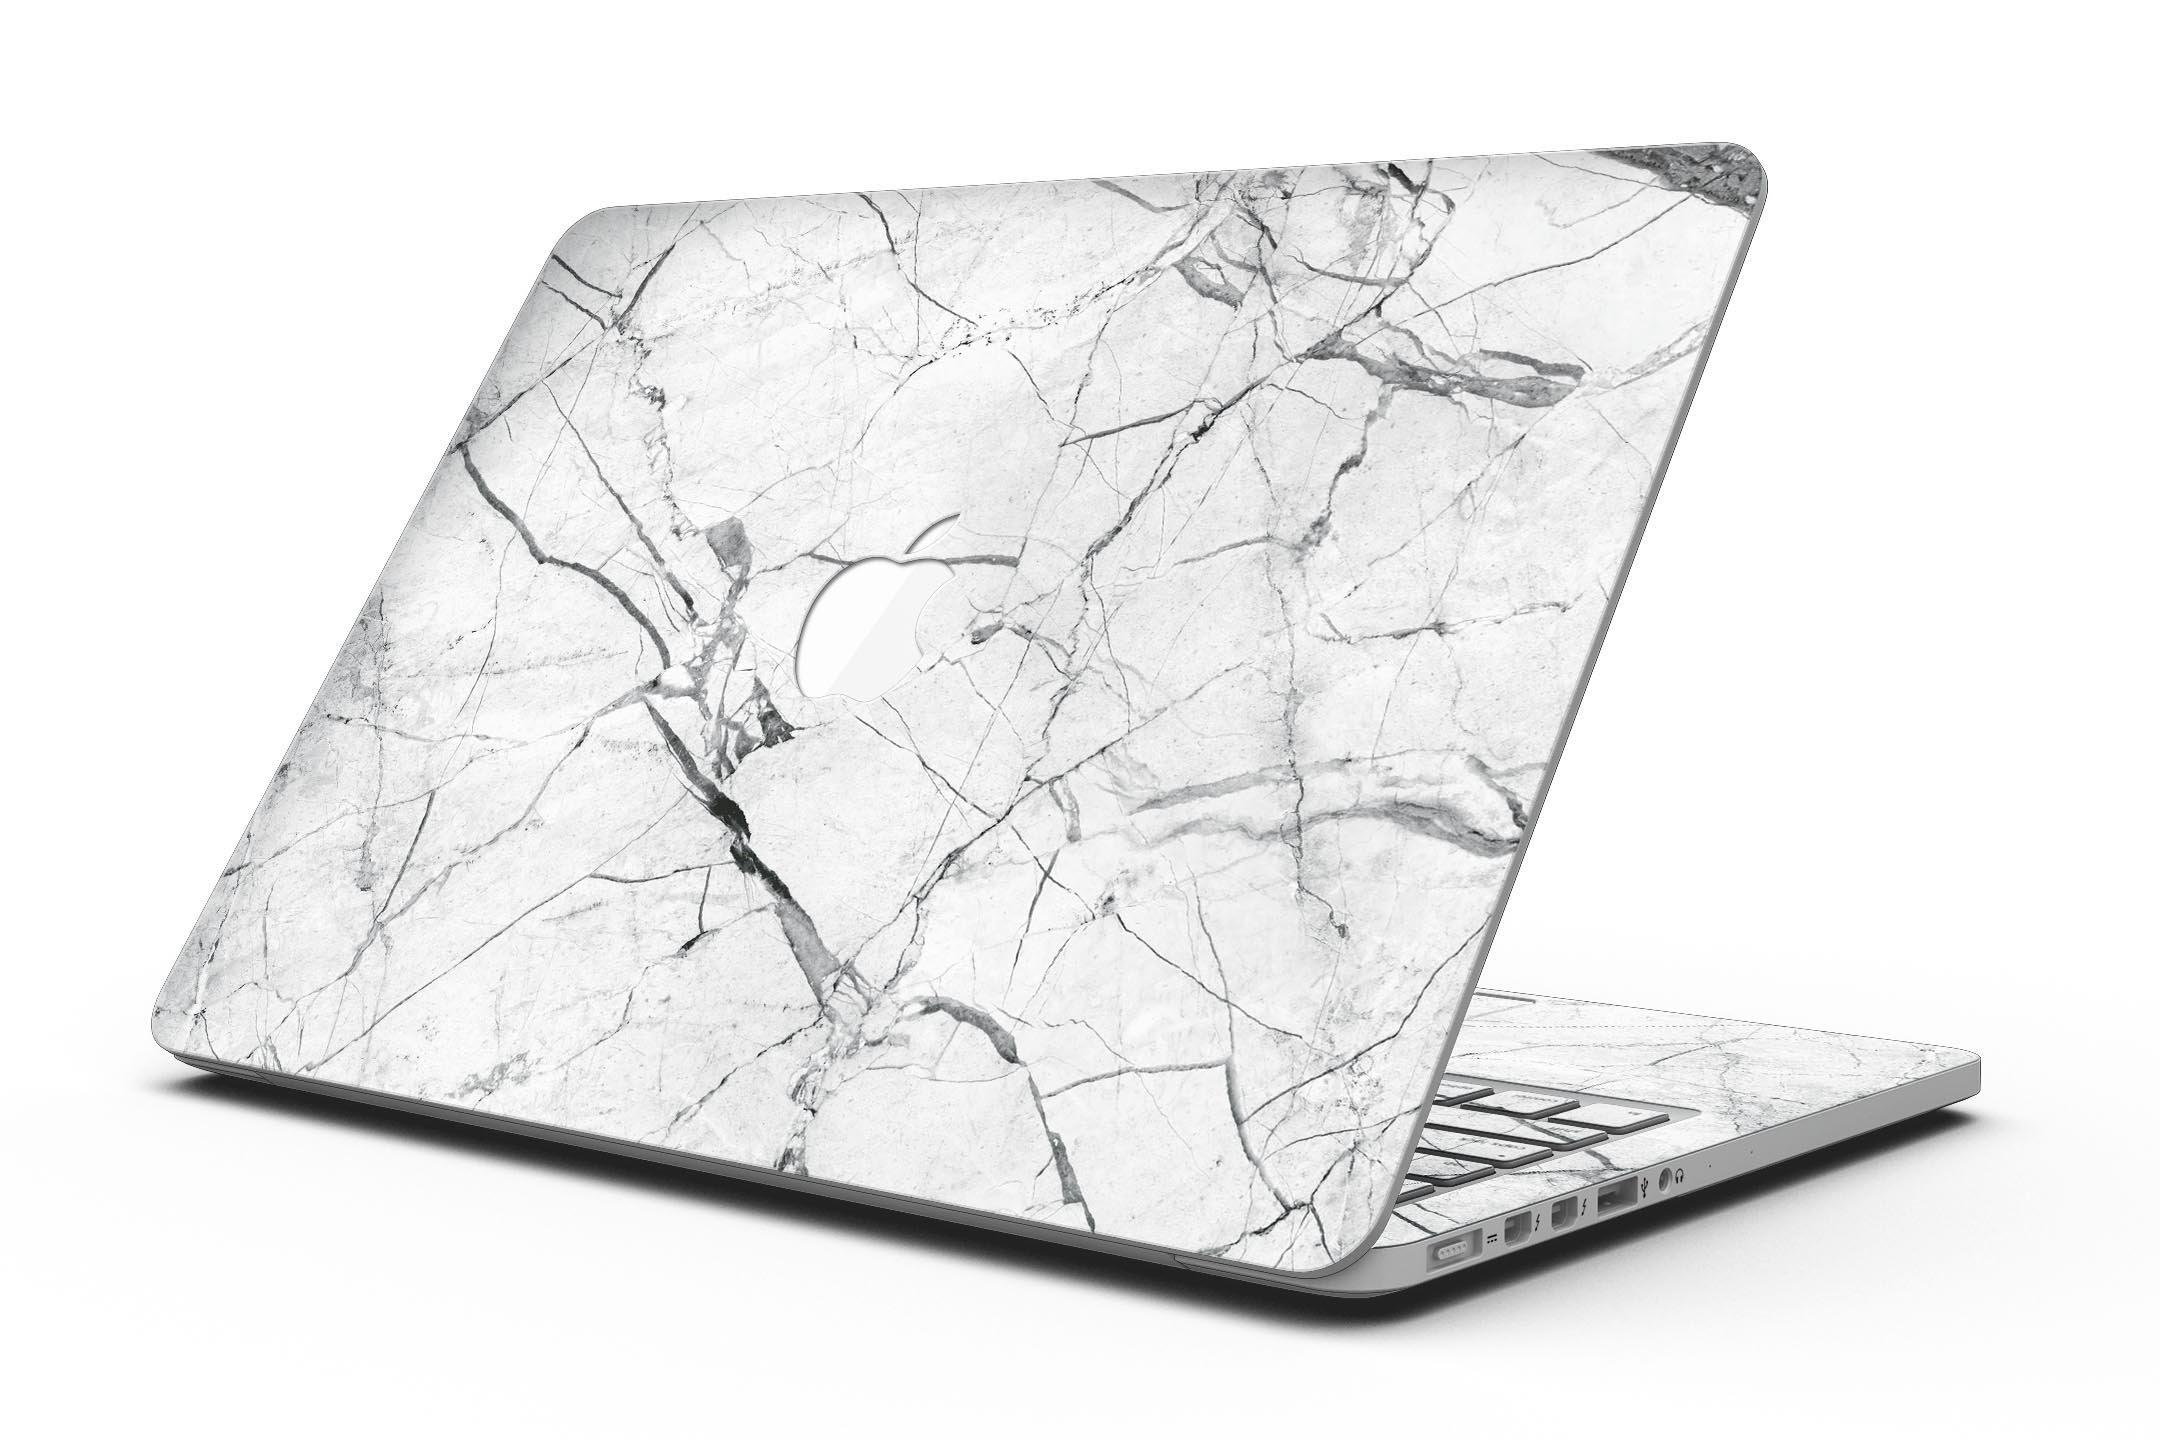 Cracked White Marble Slate - MacBook Pro with Retina Display Full-Coverage Skin Kit